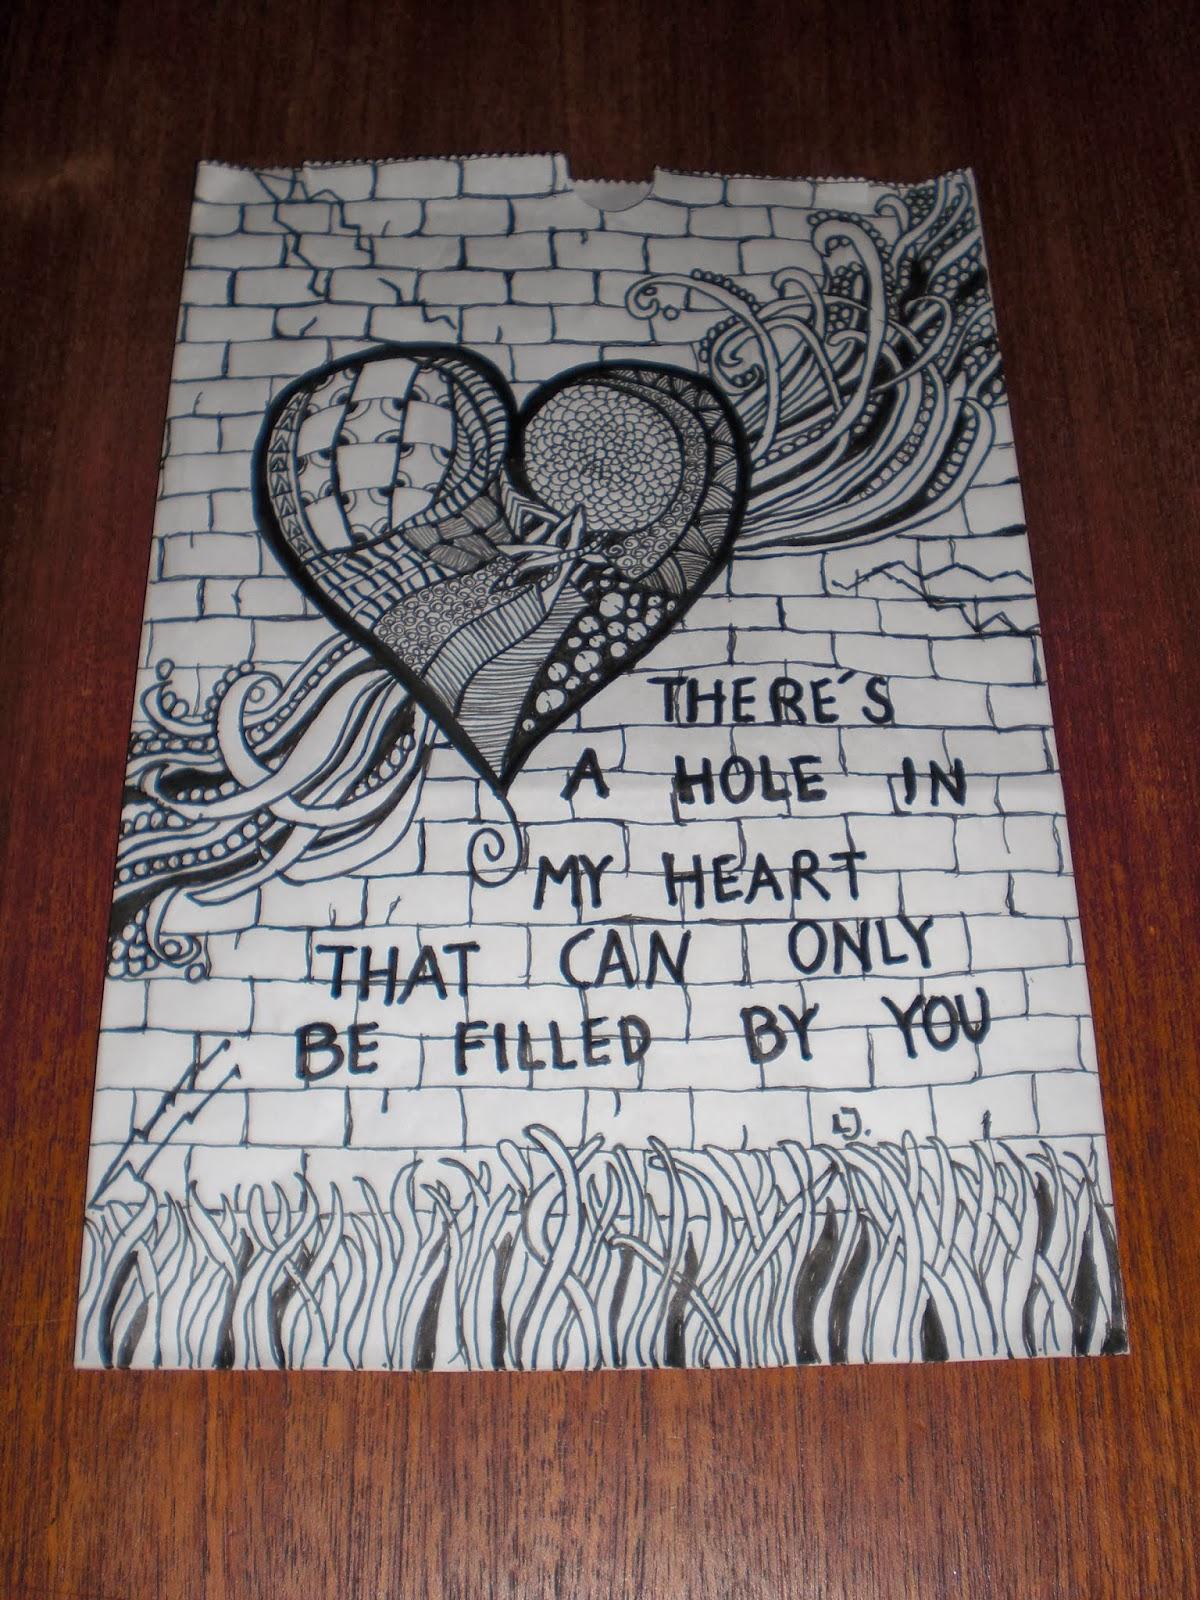 Zentangle kruseduller tegnet på lyspose for Kræftens Bekæmpelse